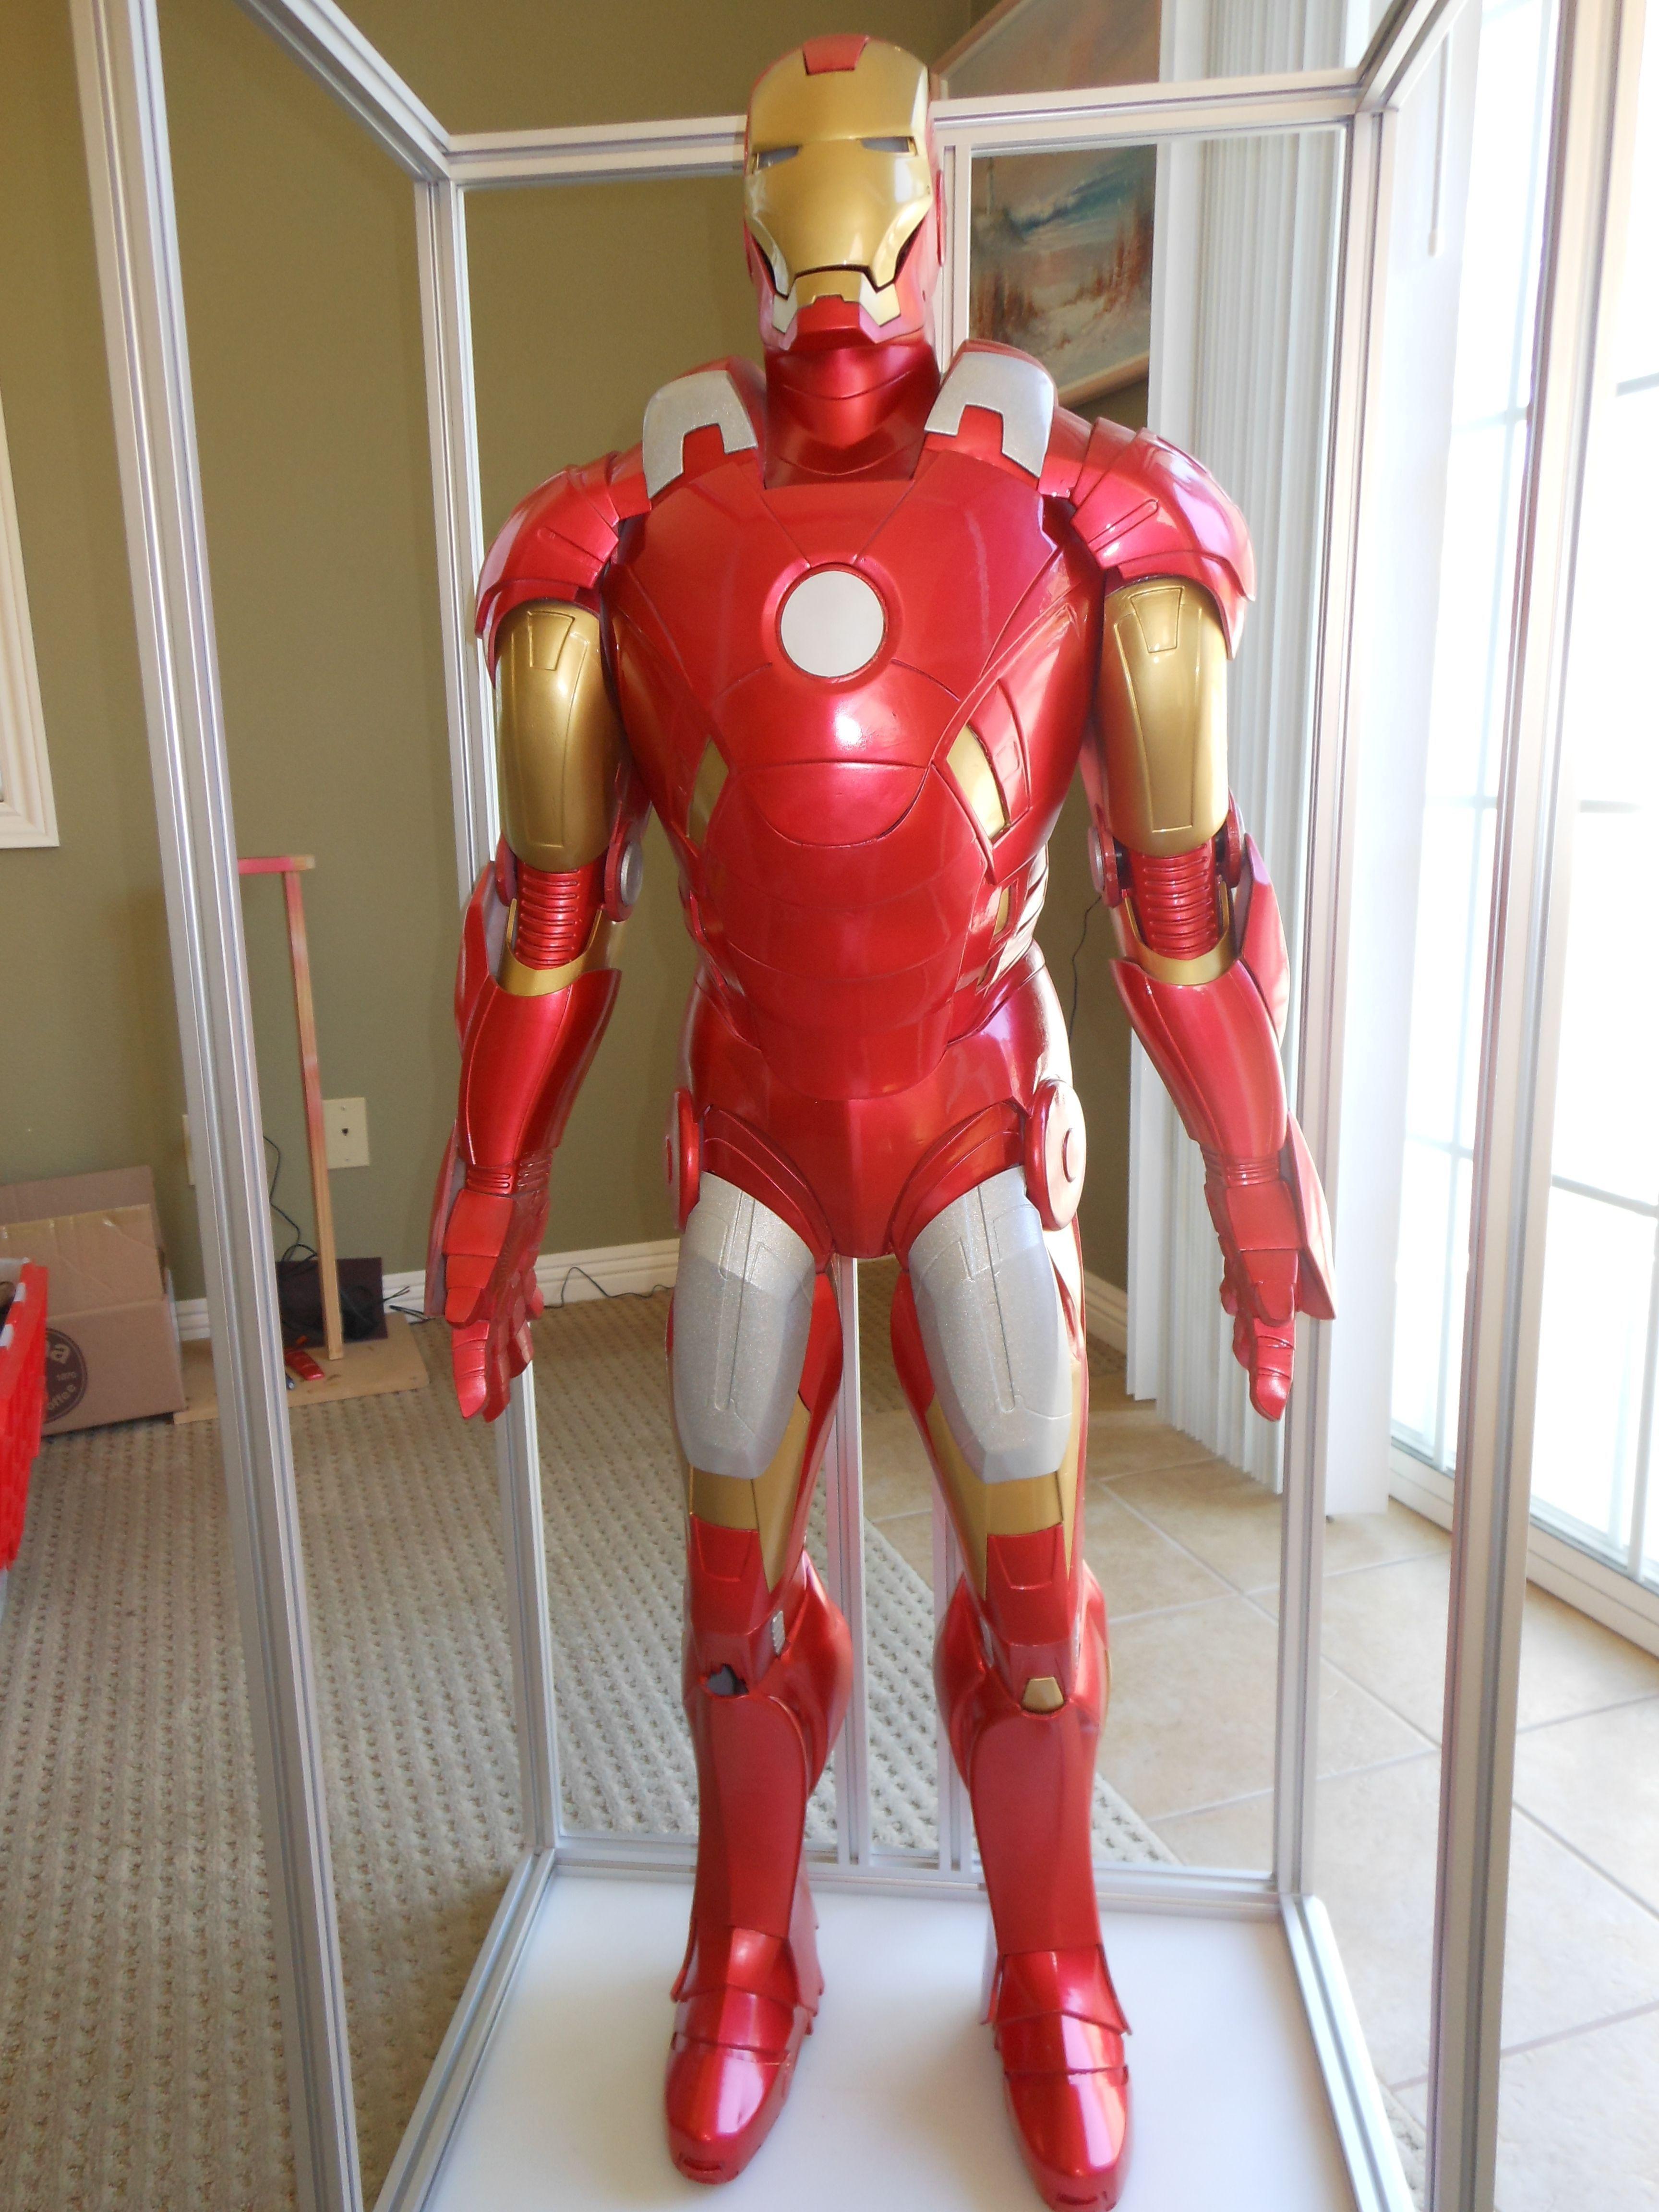 3d Printed Car Parts >> Iron man MK 7 STL 3D Model 3D printable STL - CGTrader.com